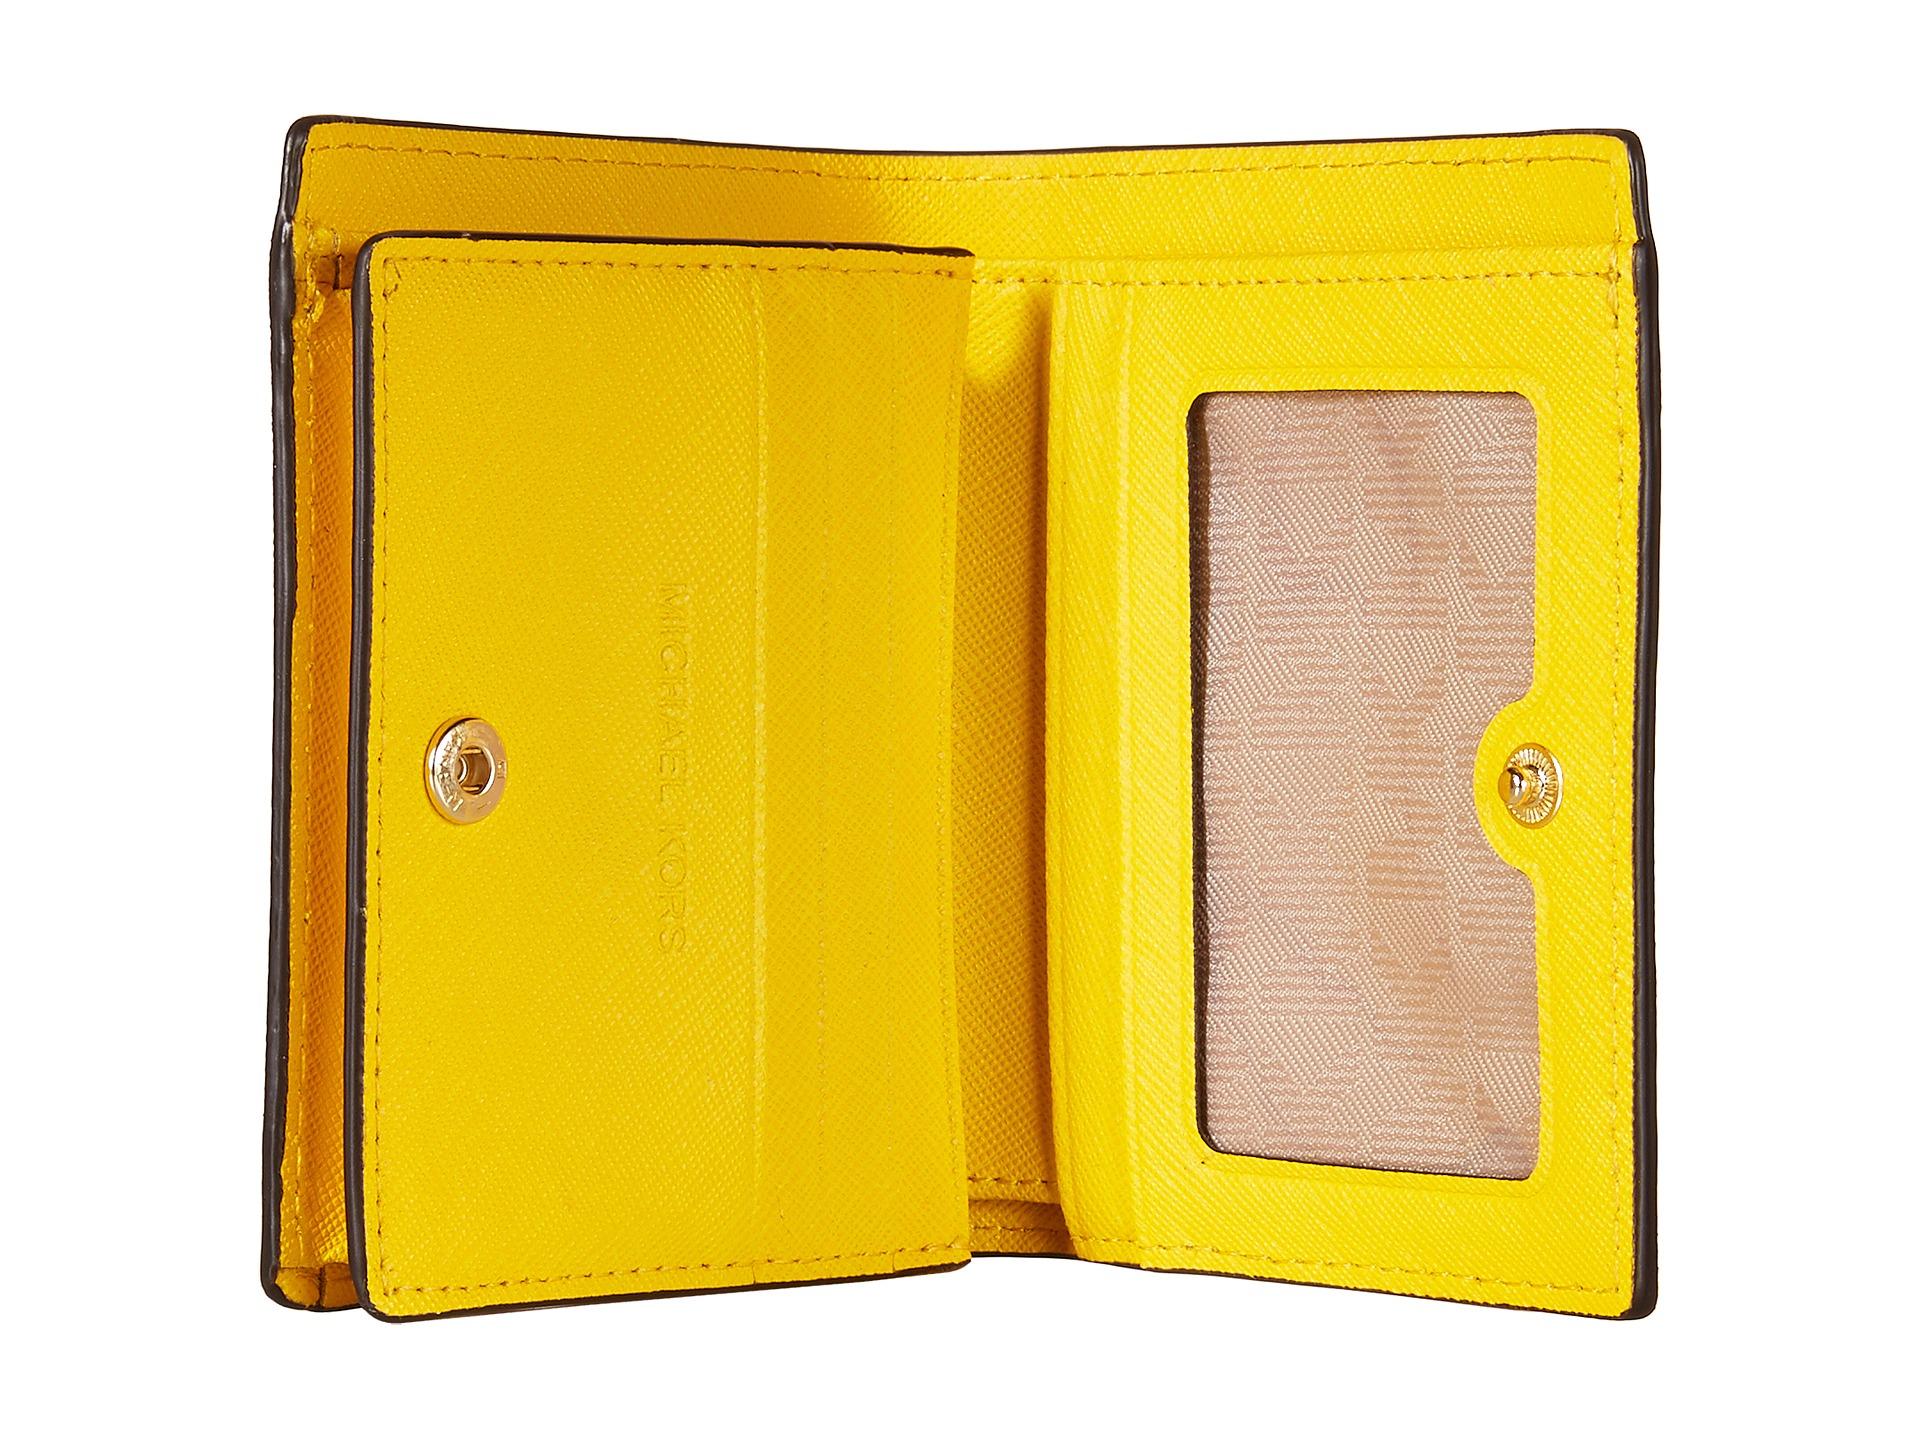 314d213b2464 MICHAEL Michael Kors Jet Set Travel Flap Card Holder in Yellow - Lyst